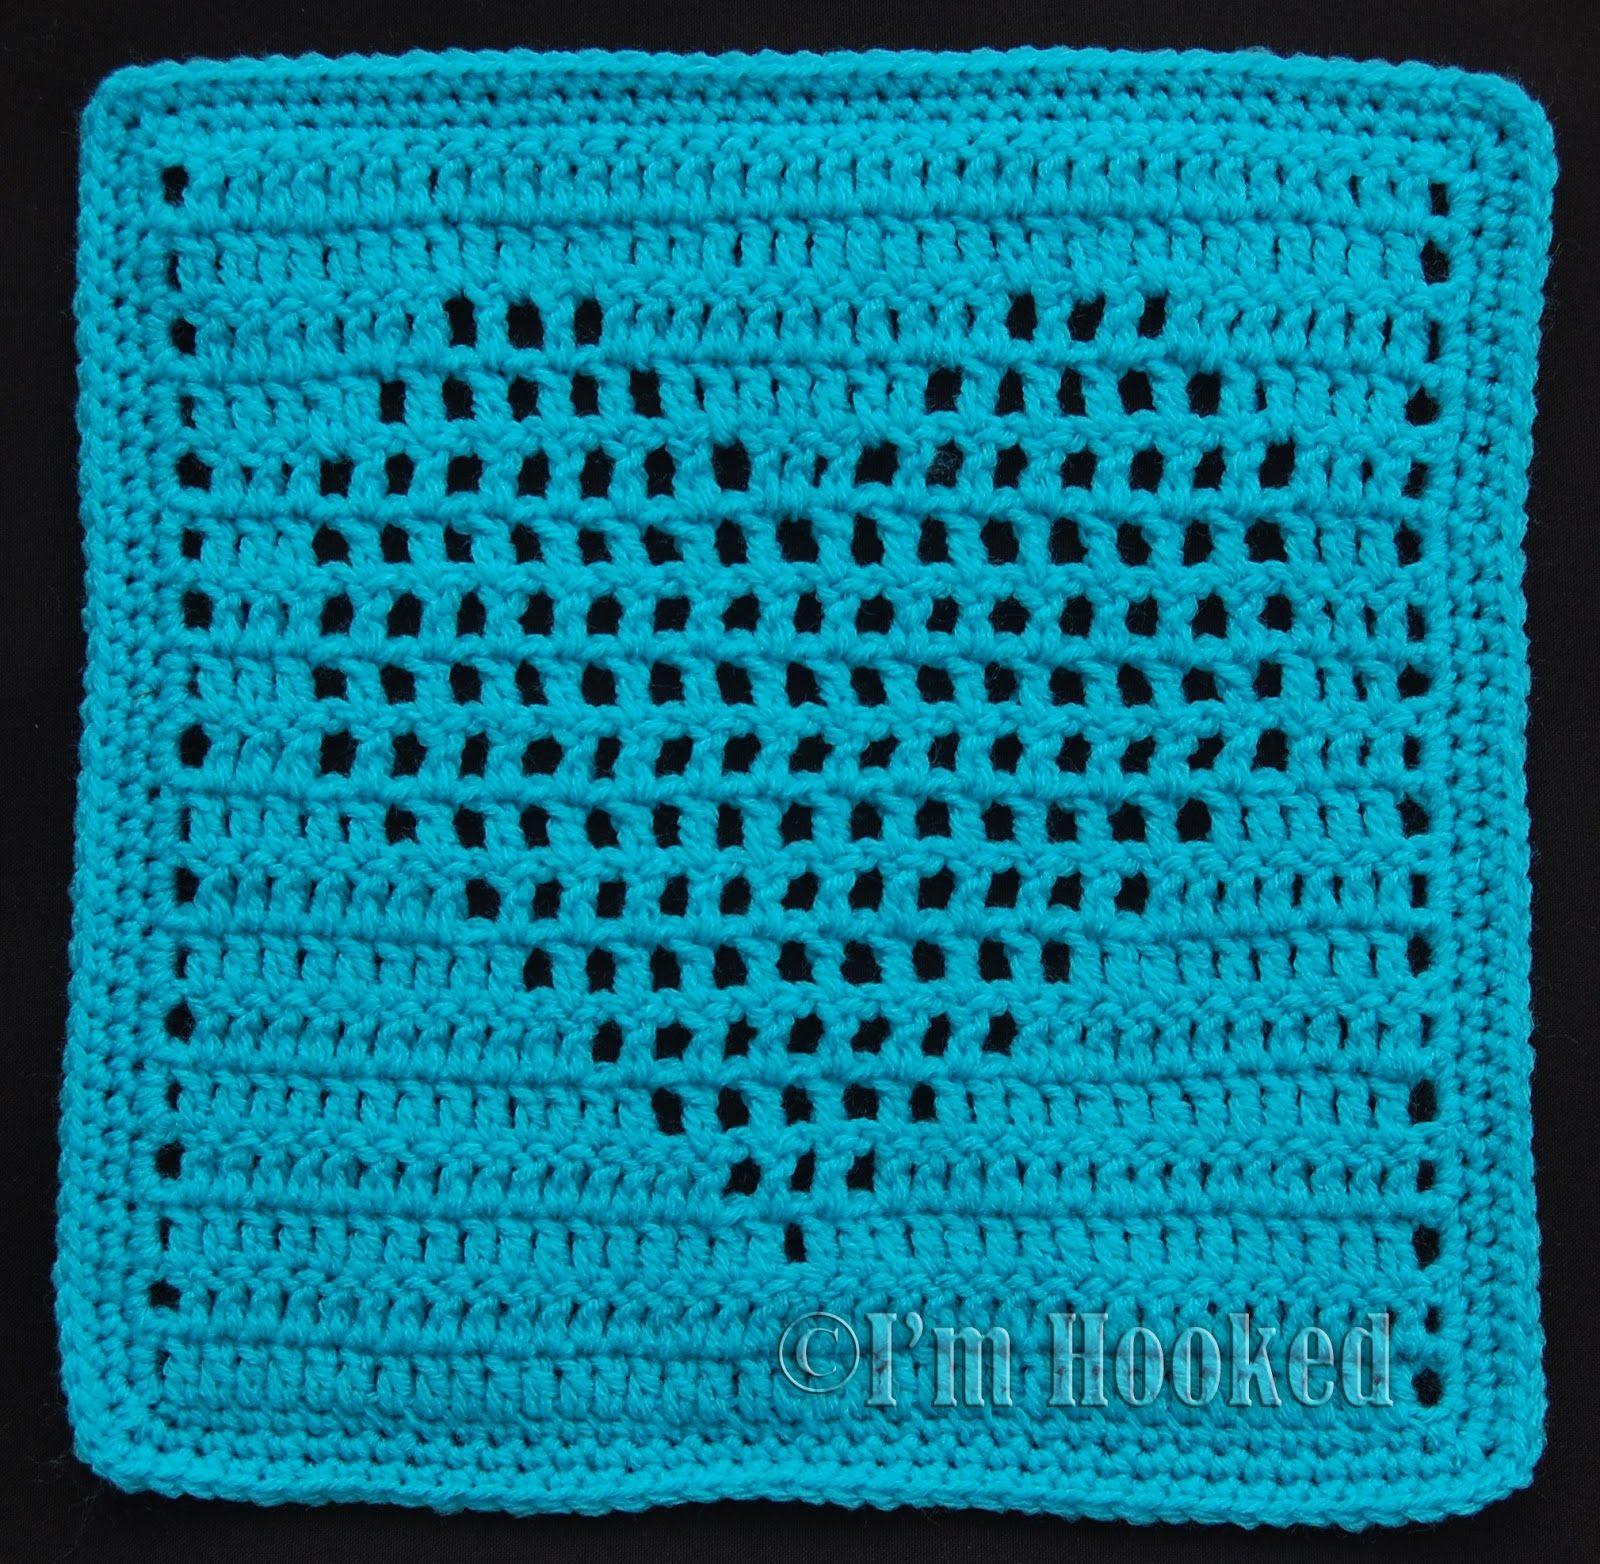 PrintFriendly.com: Print web pages, create PDFs | Crochet ...